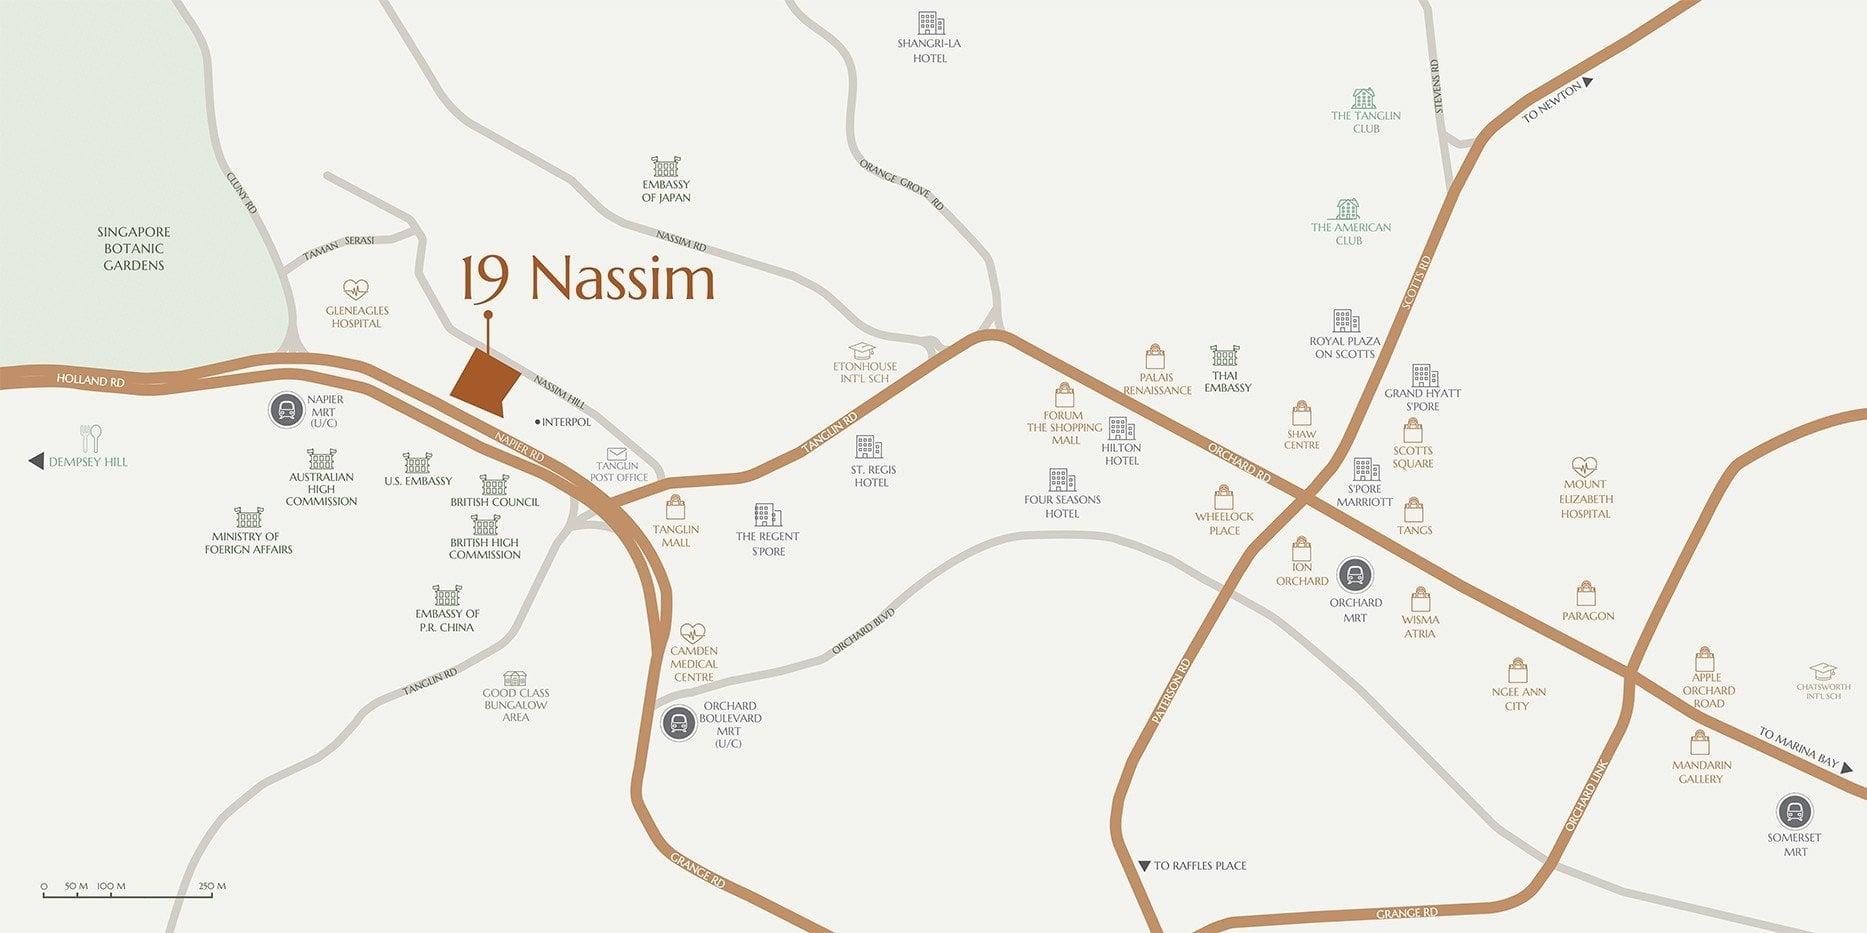 19nassim-location--map